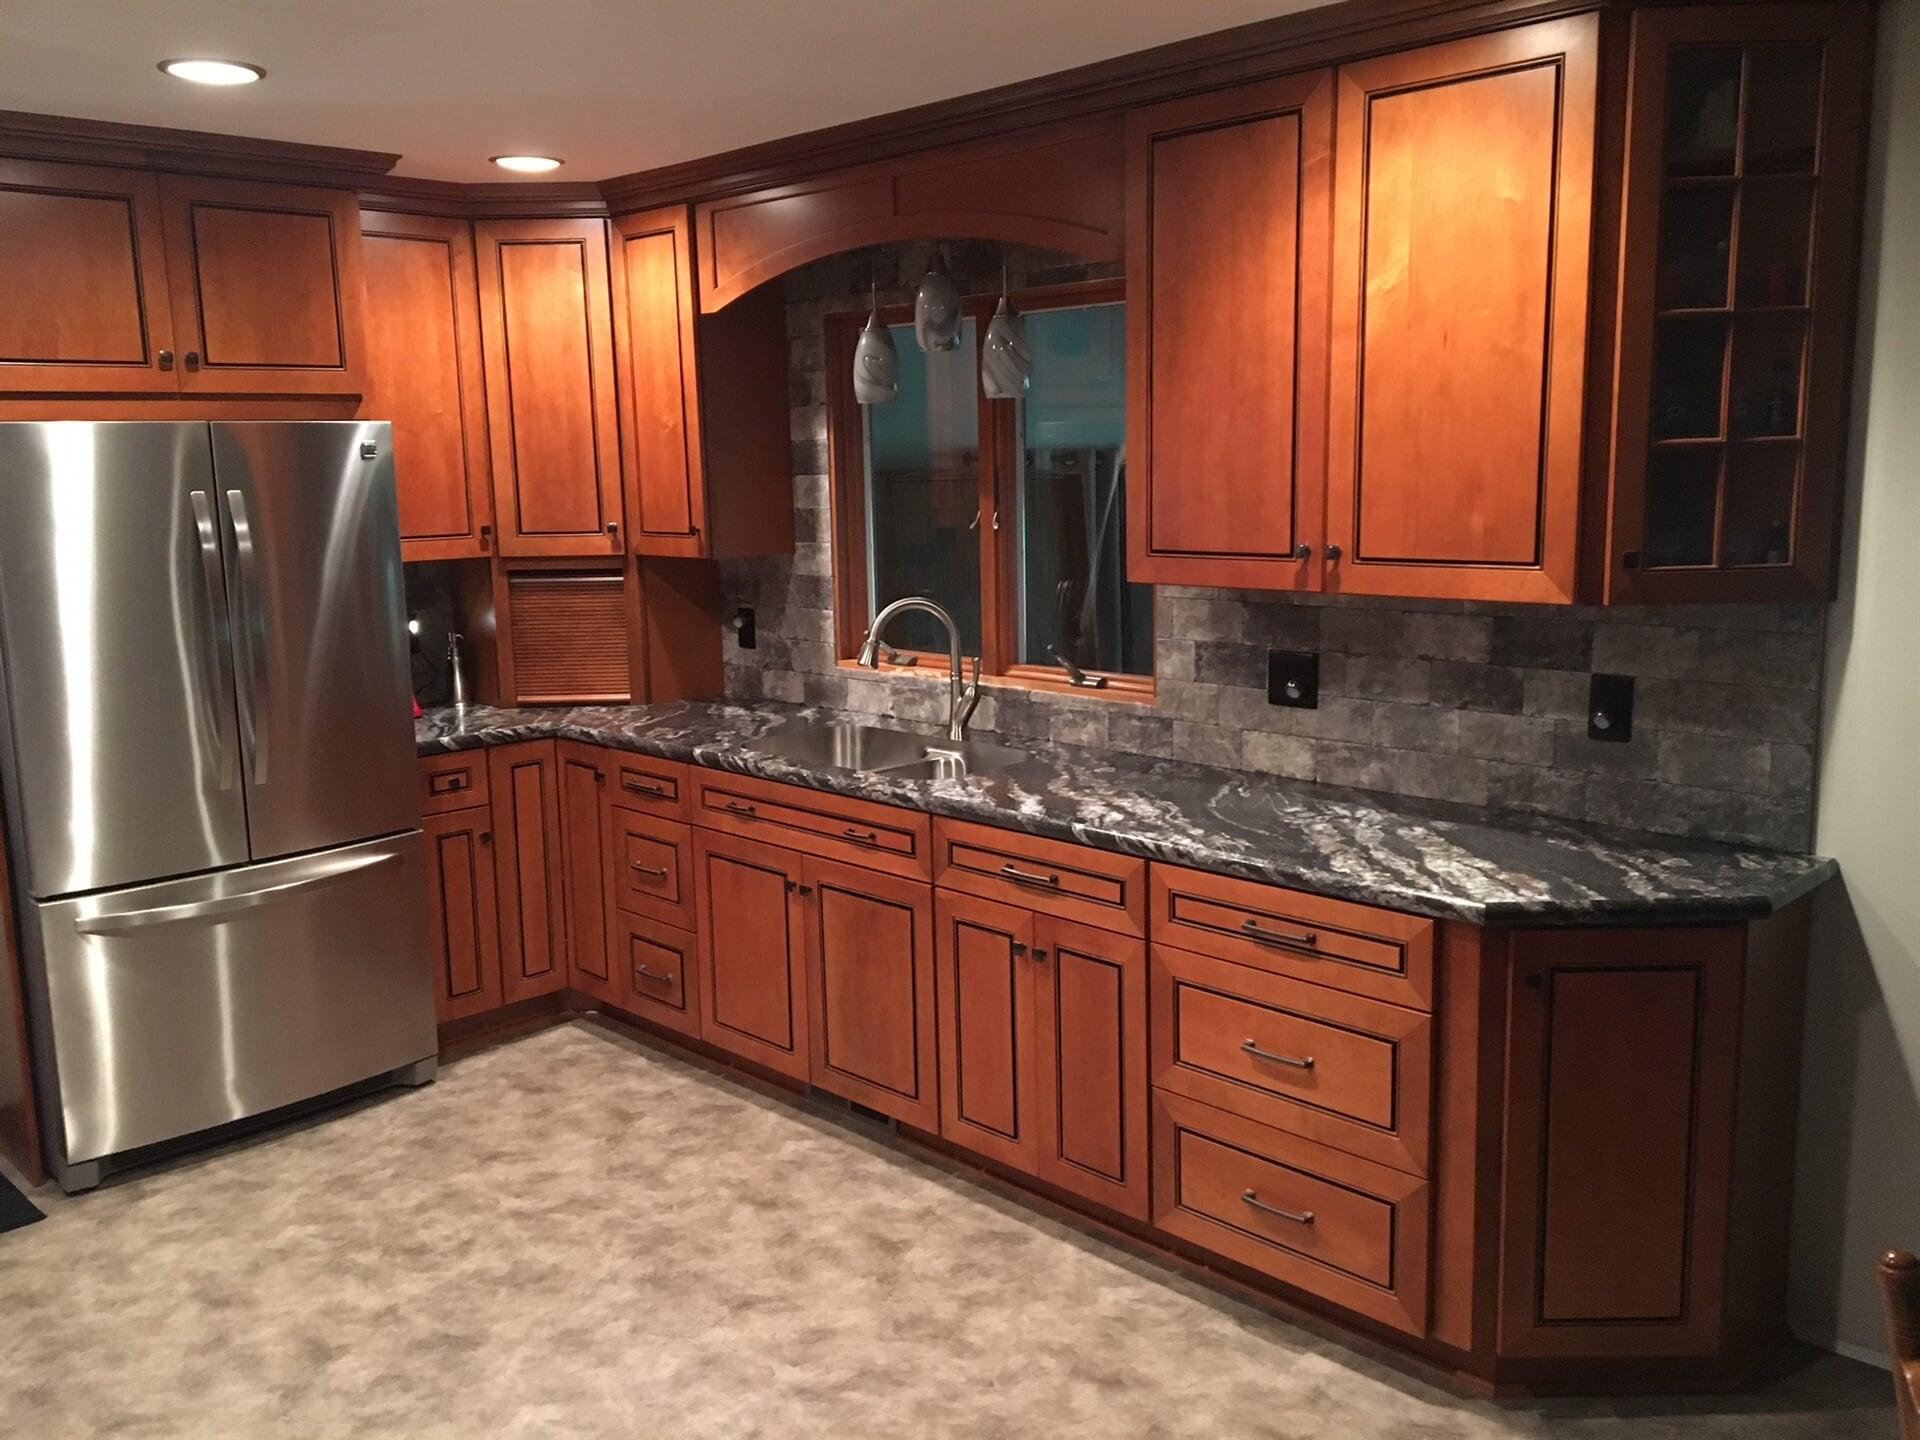 Kitchen remodel with natural granite countertop in Trenton, MI